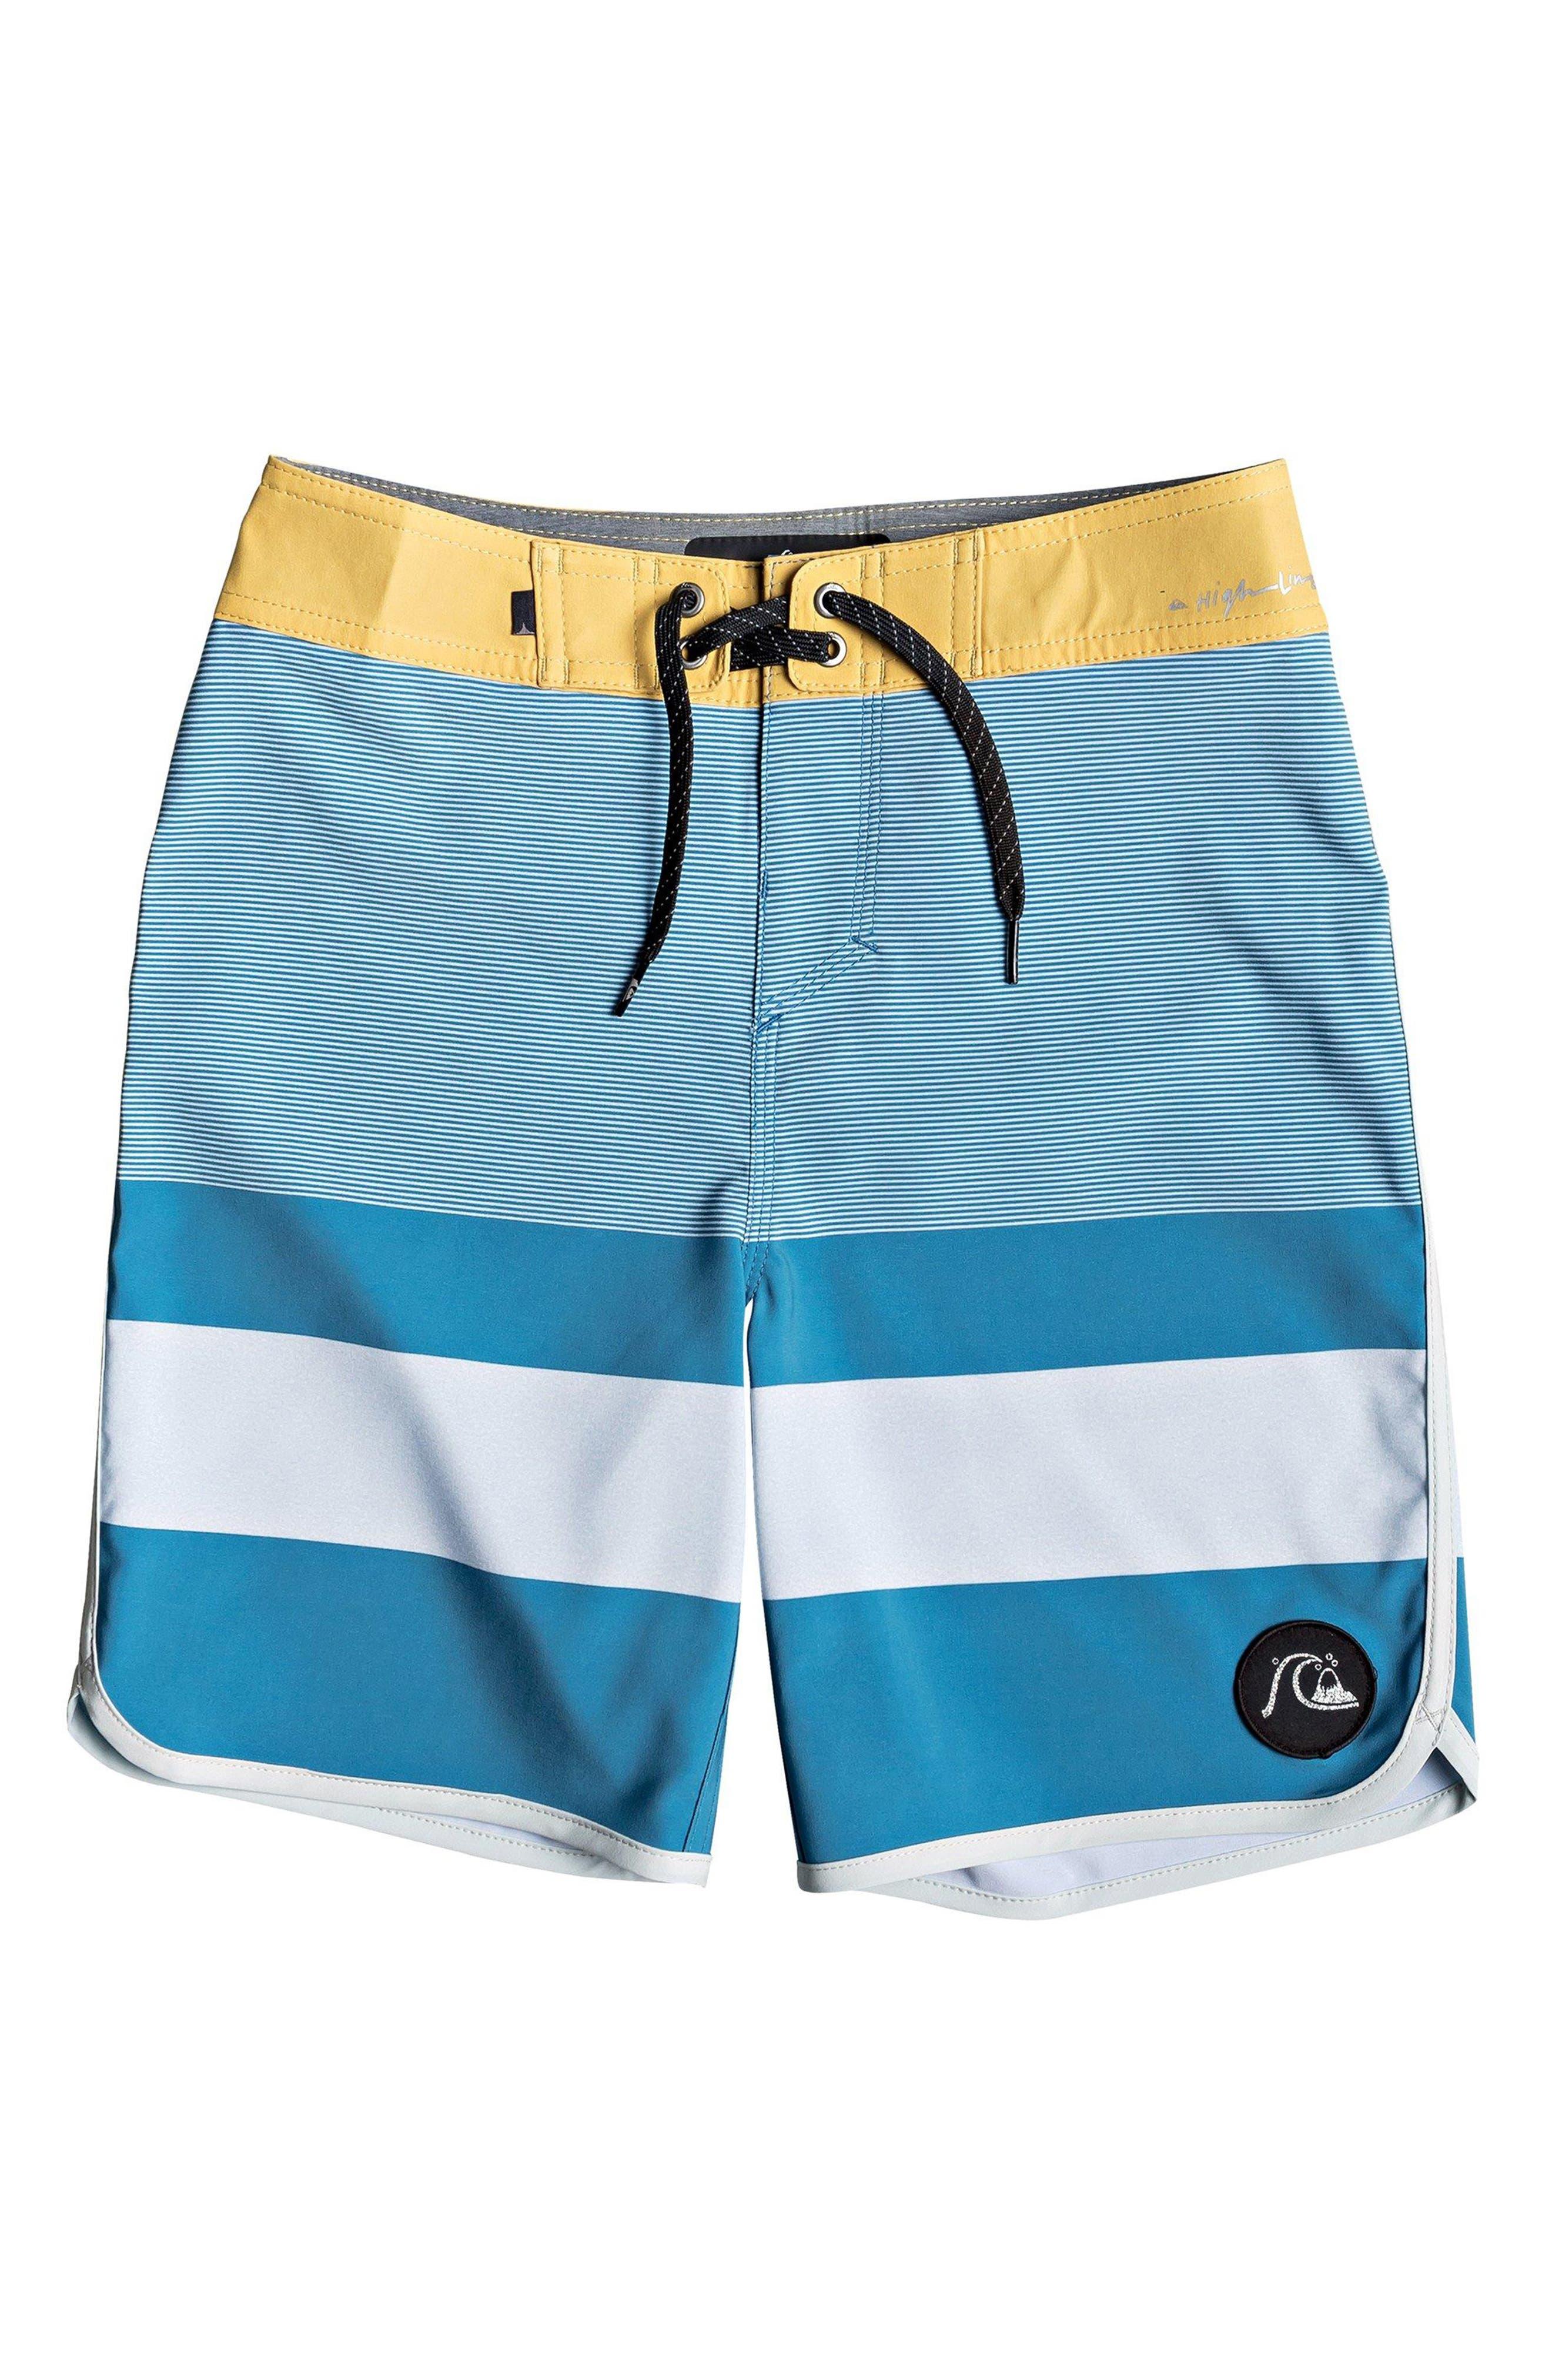 QUIKSILVER Highline Tijuana Board Shorts, Main, color, SOUTHERN OCEAN